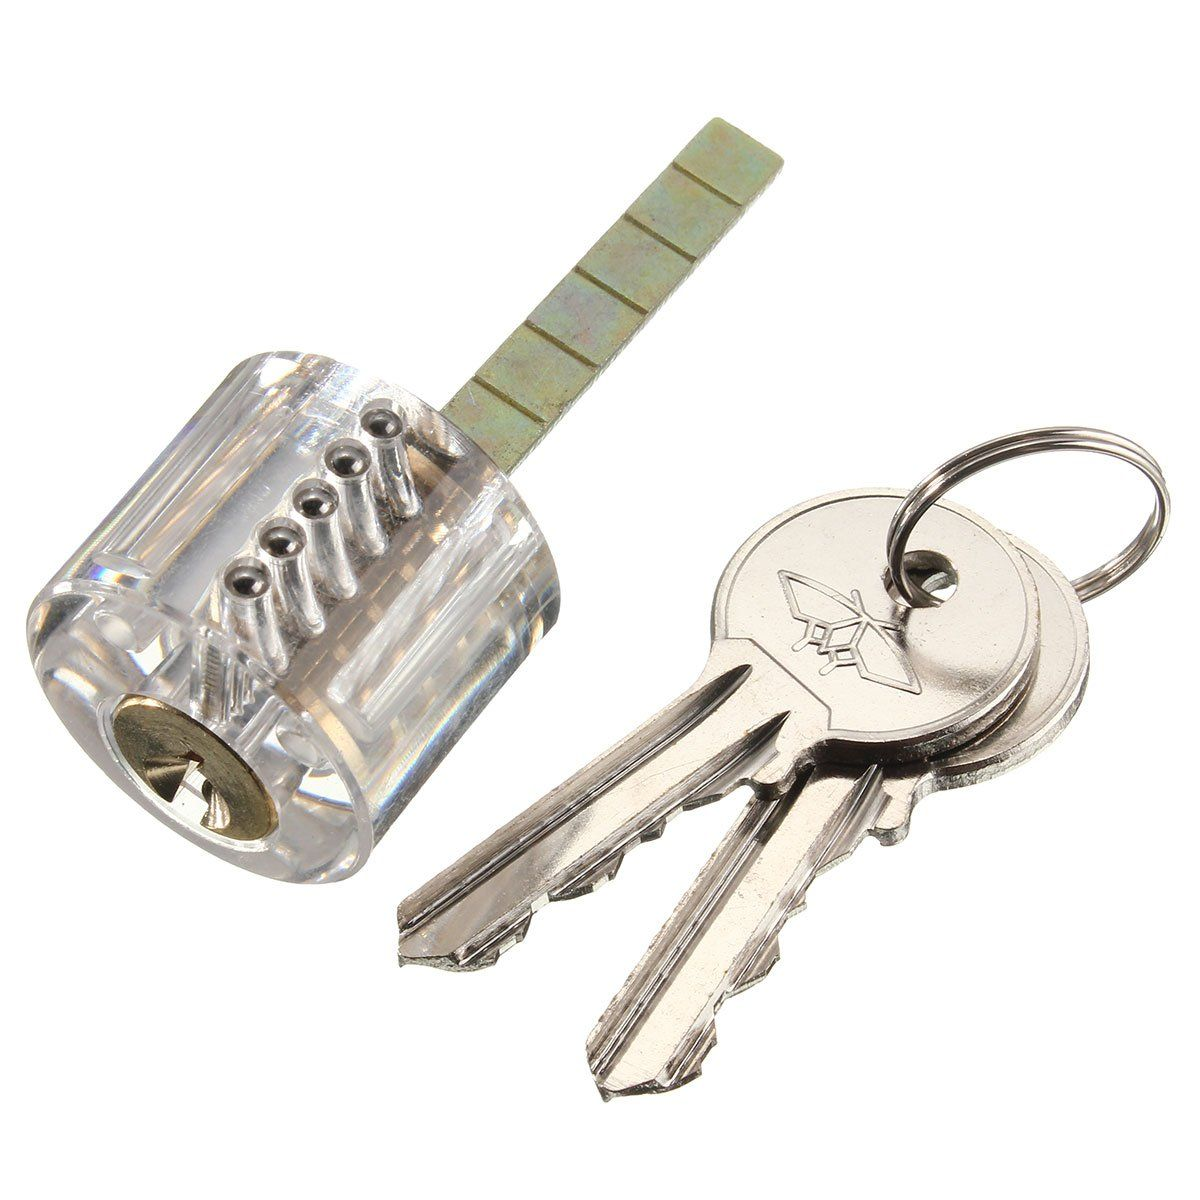 Pick Cutaway Visable Padlock Lock For Locksmith Practice Training Transparent 10pcs Lockpick Tool Set Skill Picks Tools Https